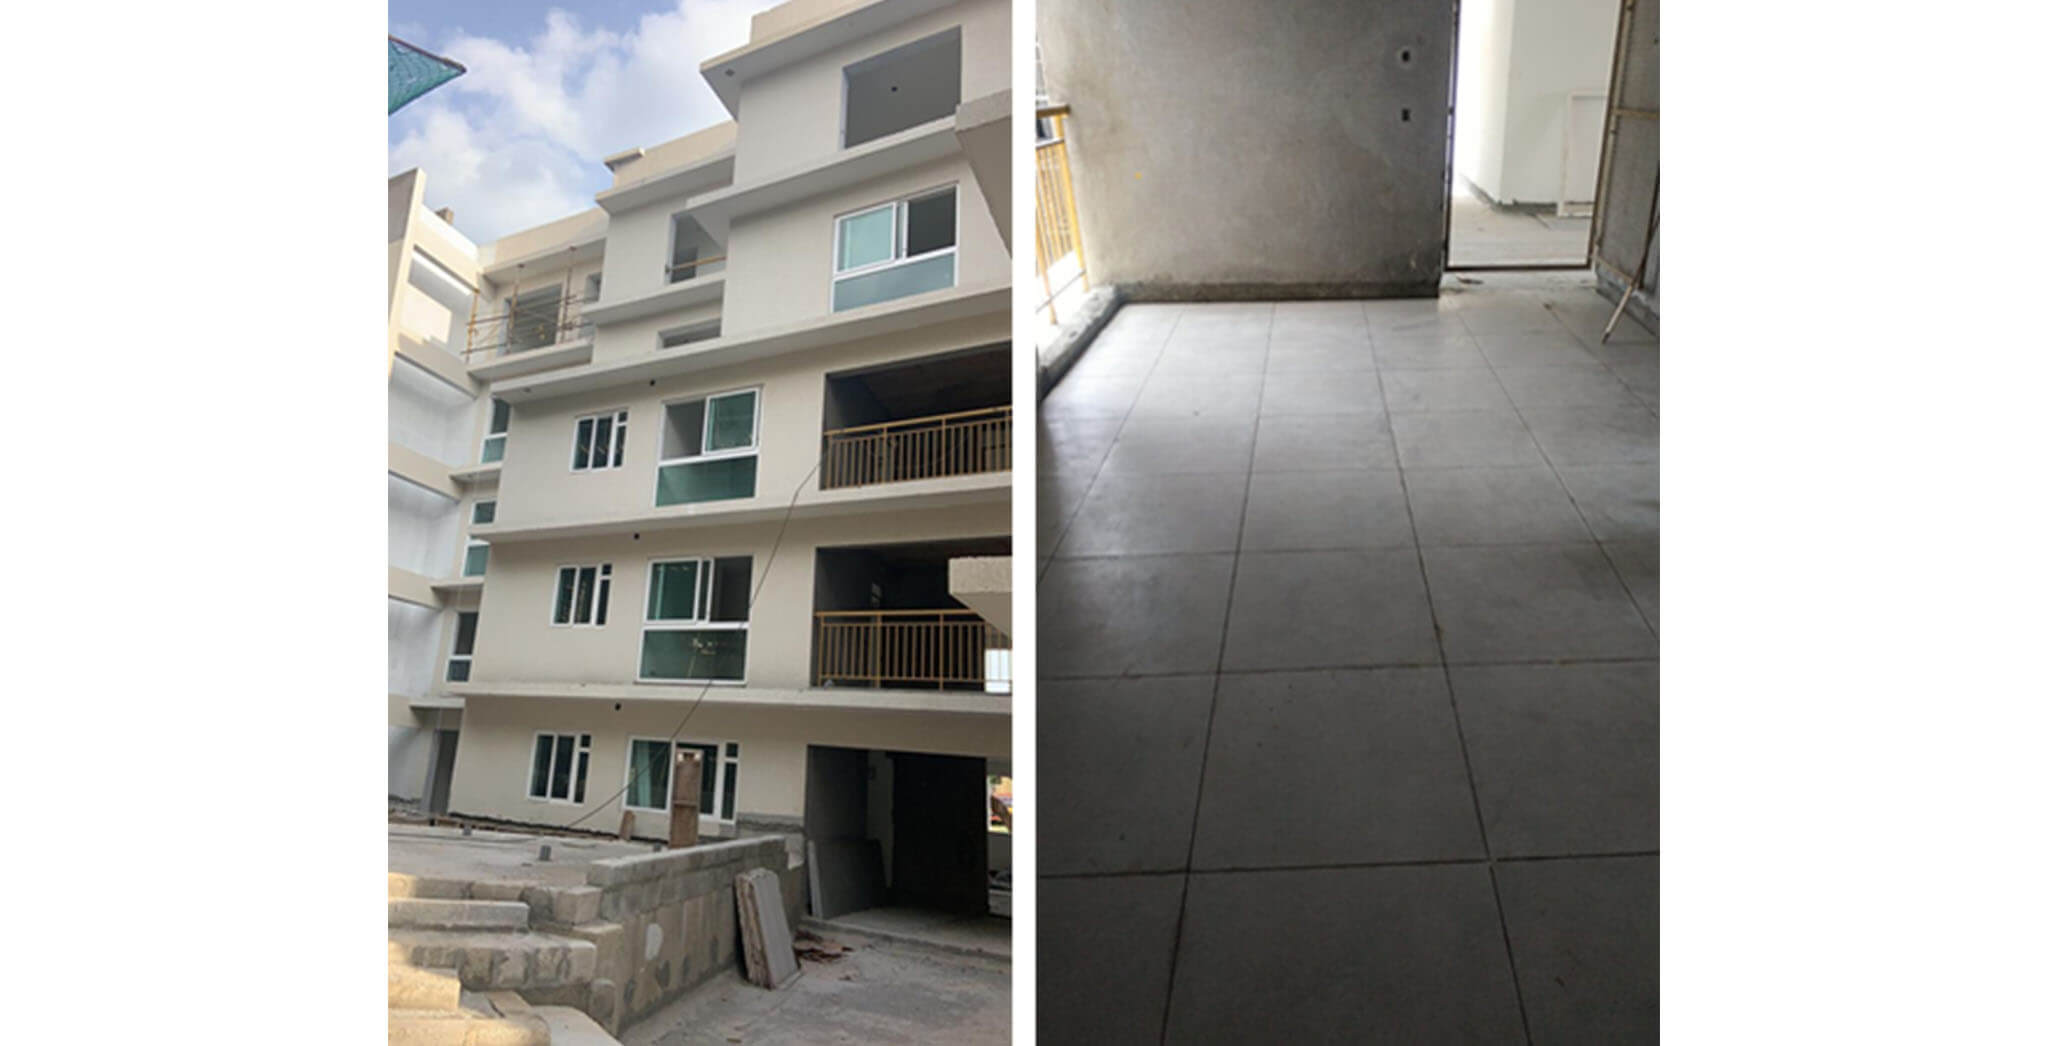 May 2021 - J Block: 1st to 4th floor lobby flooring, and  UPVC window installation work-in-progress.